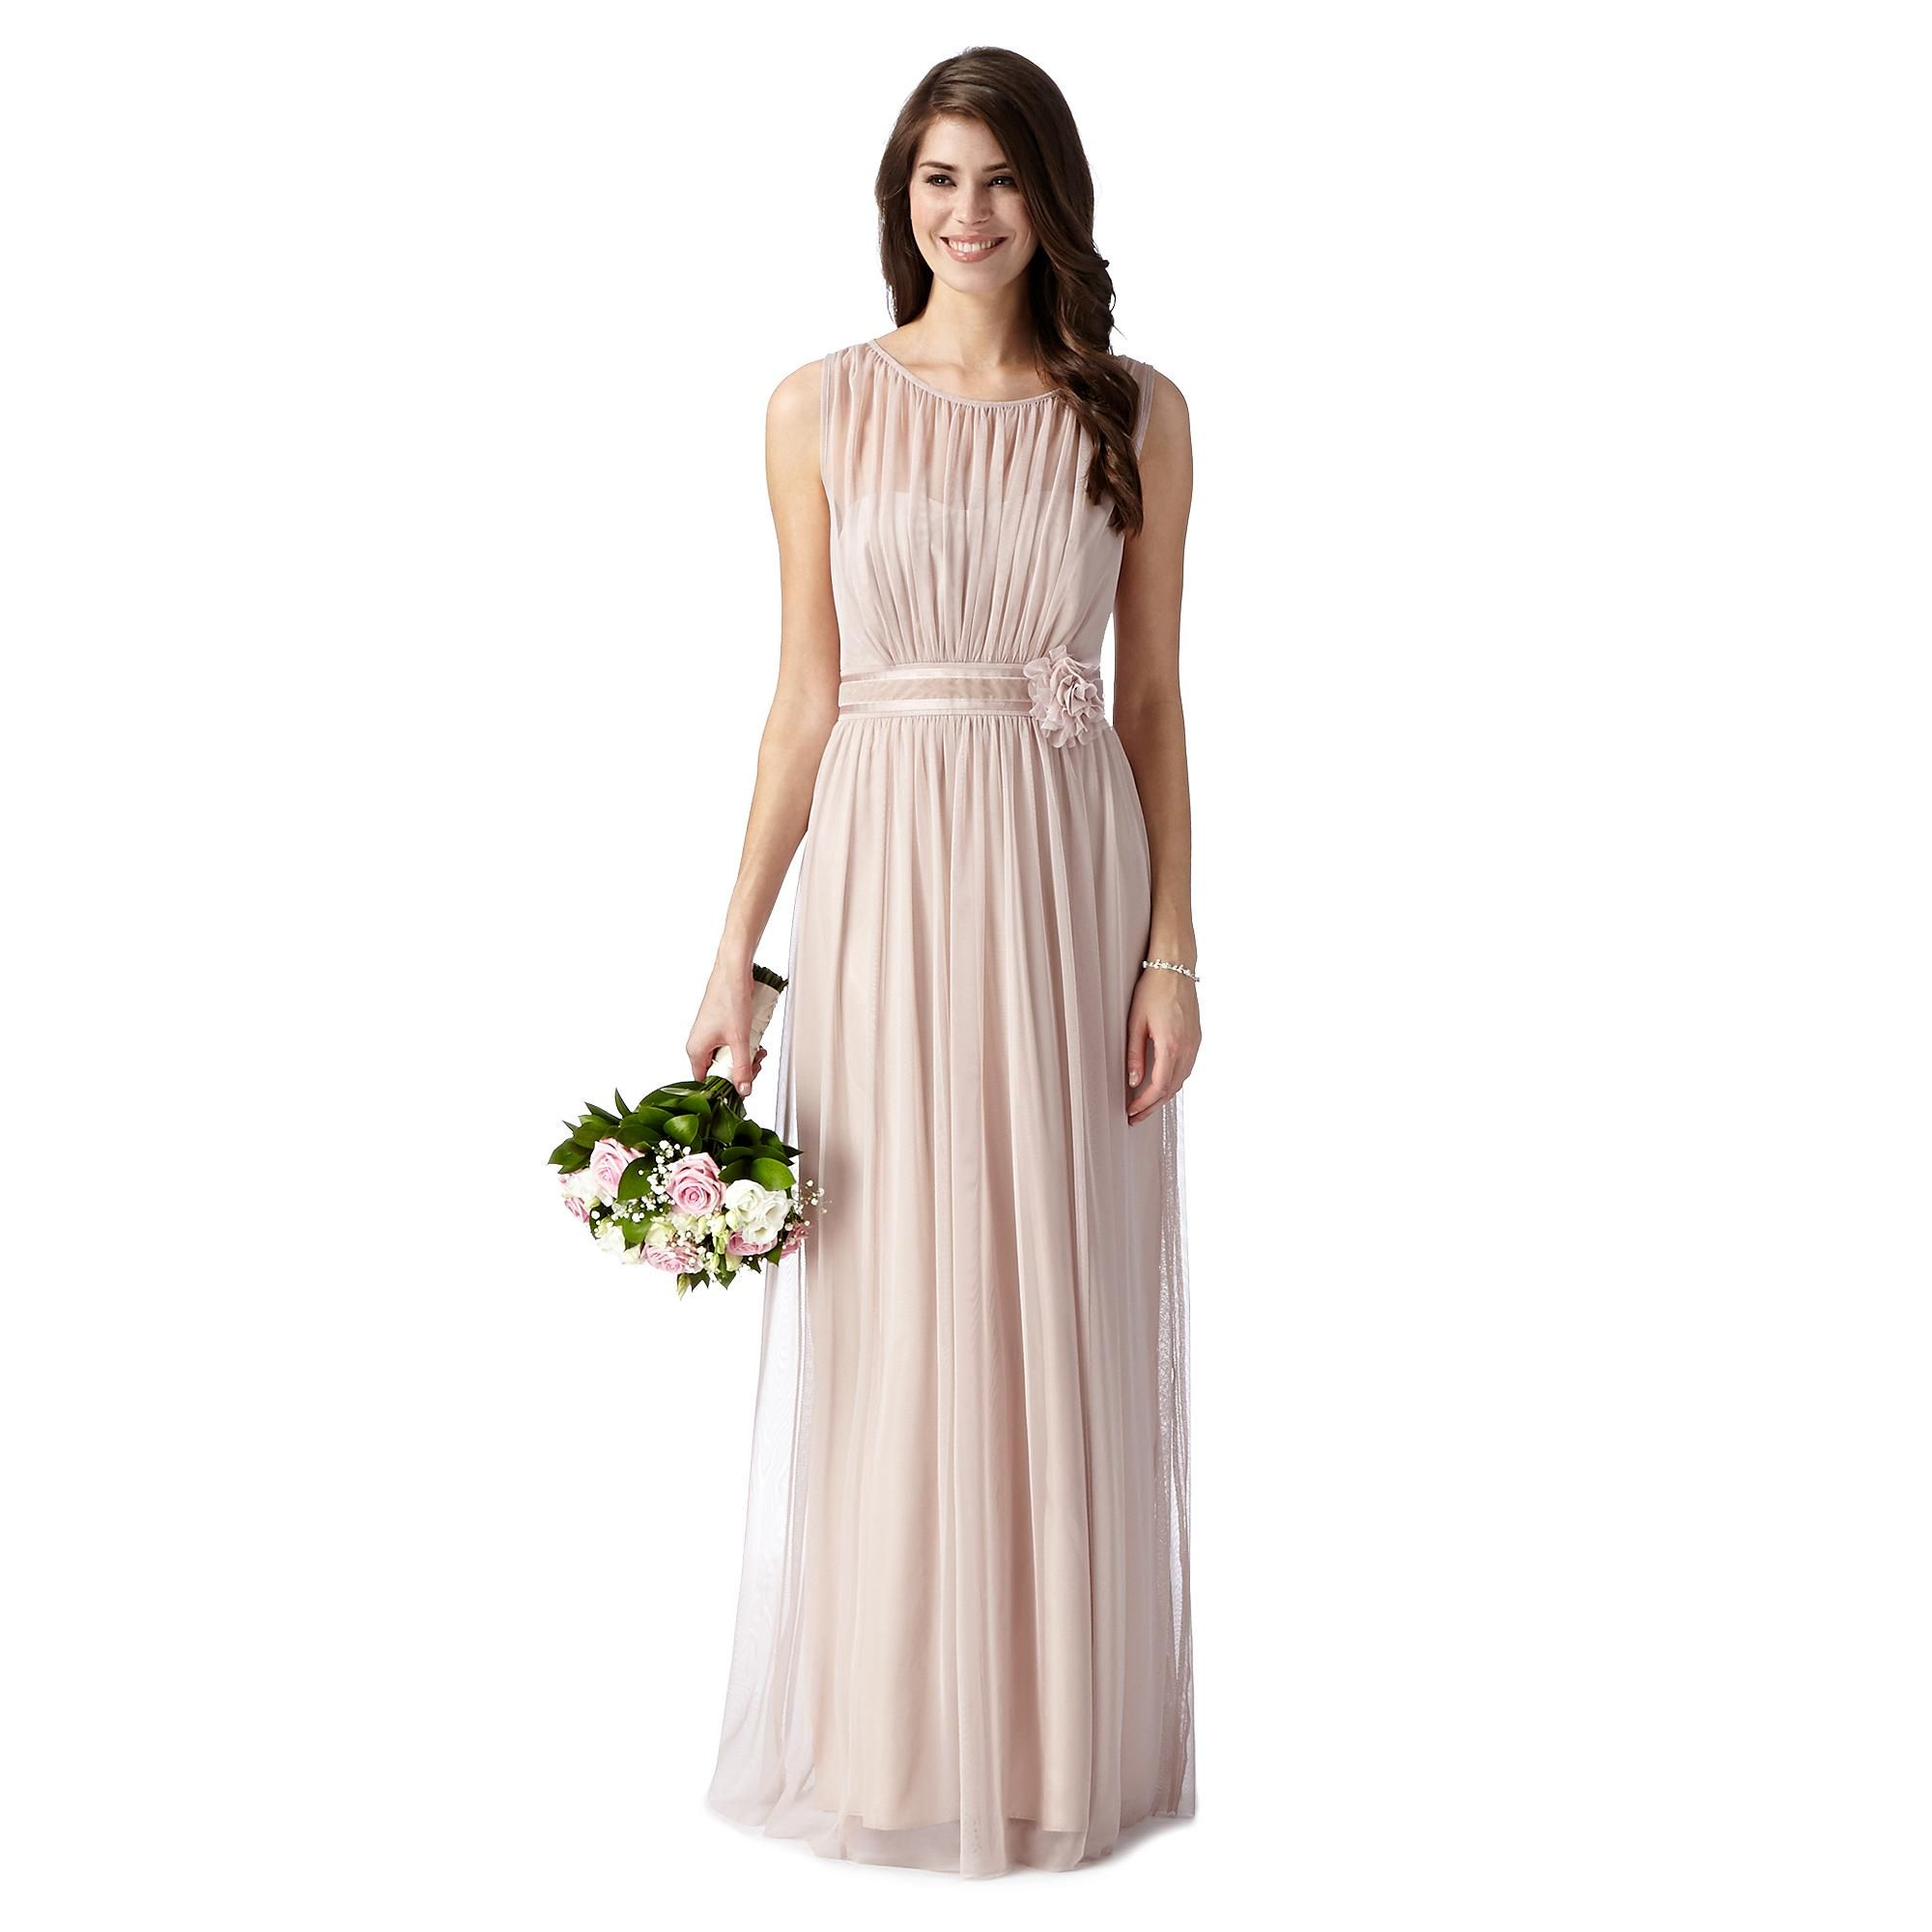 Pale pink mesh corsage maxi dress bridesmaid dresses debenhams pale pink mesh corsage maxi dress bridesmaid dresses debenhams ombrellifo Gallery